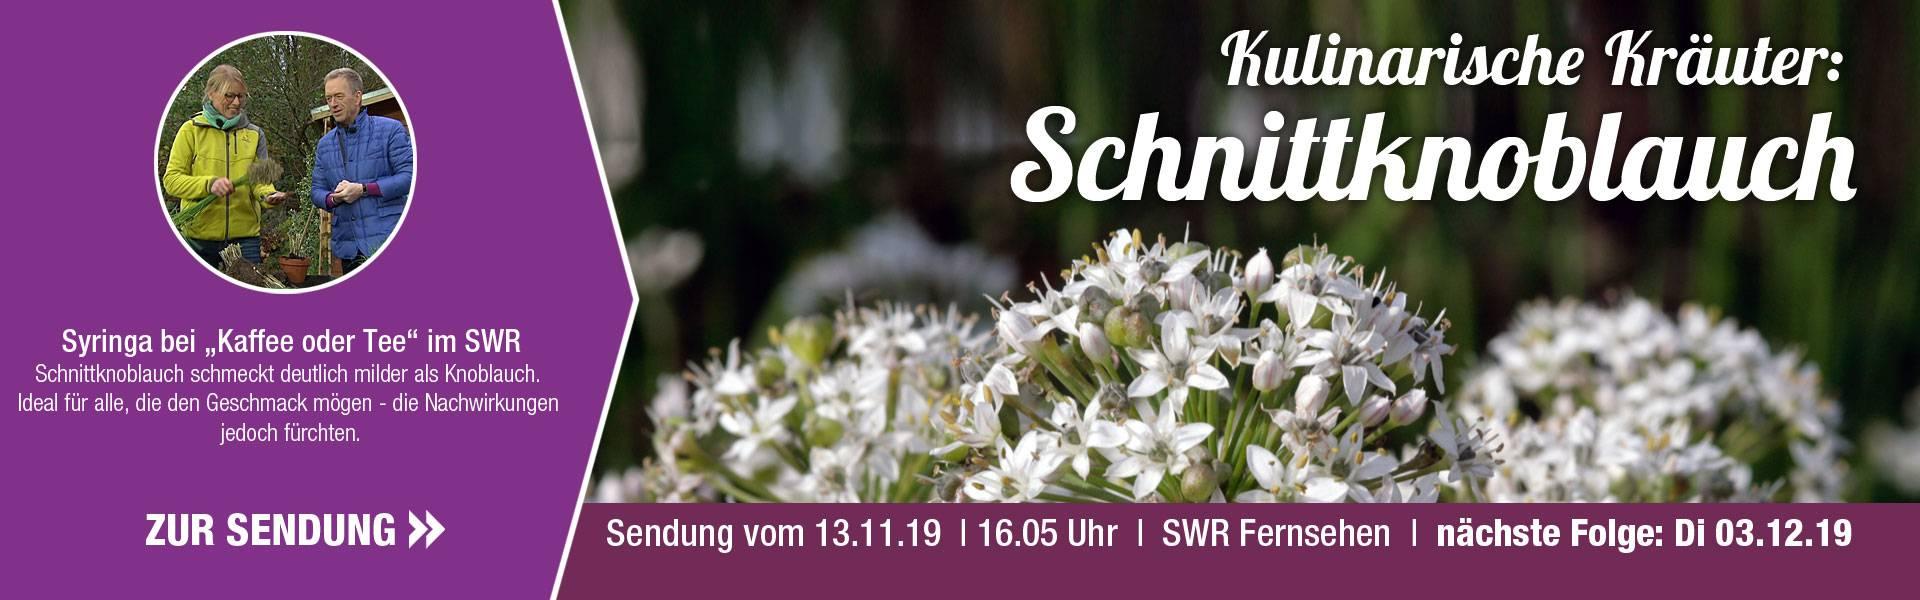 SWR_11_Schnittknoblauch_1